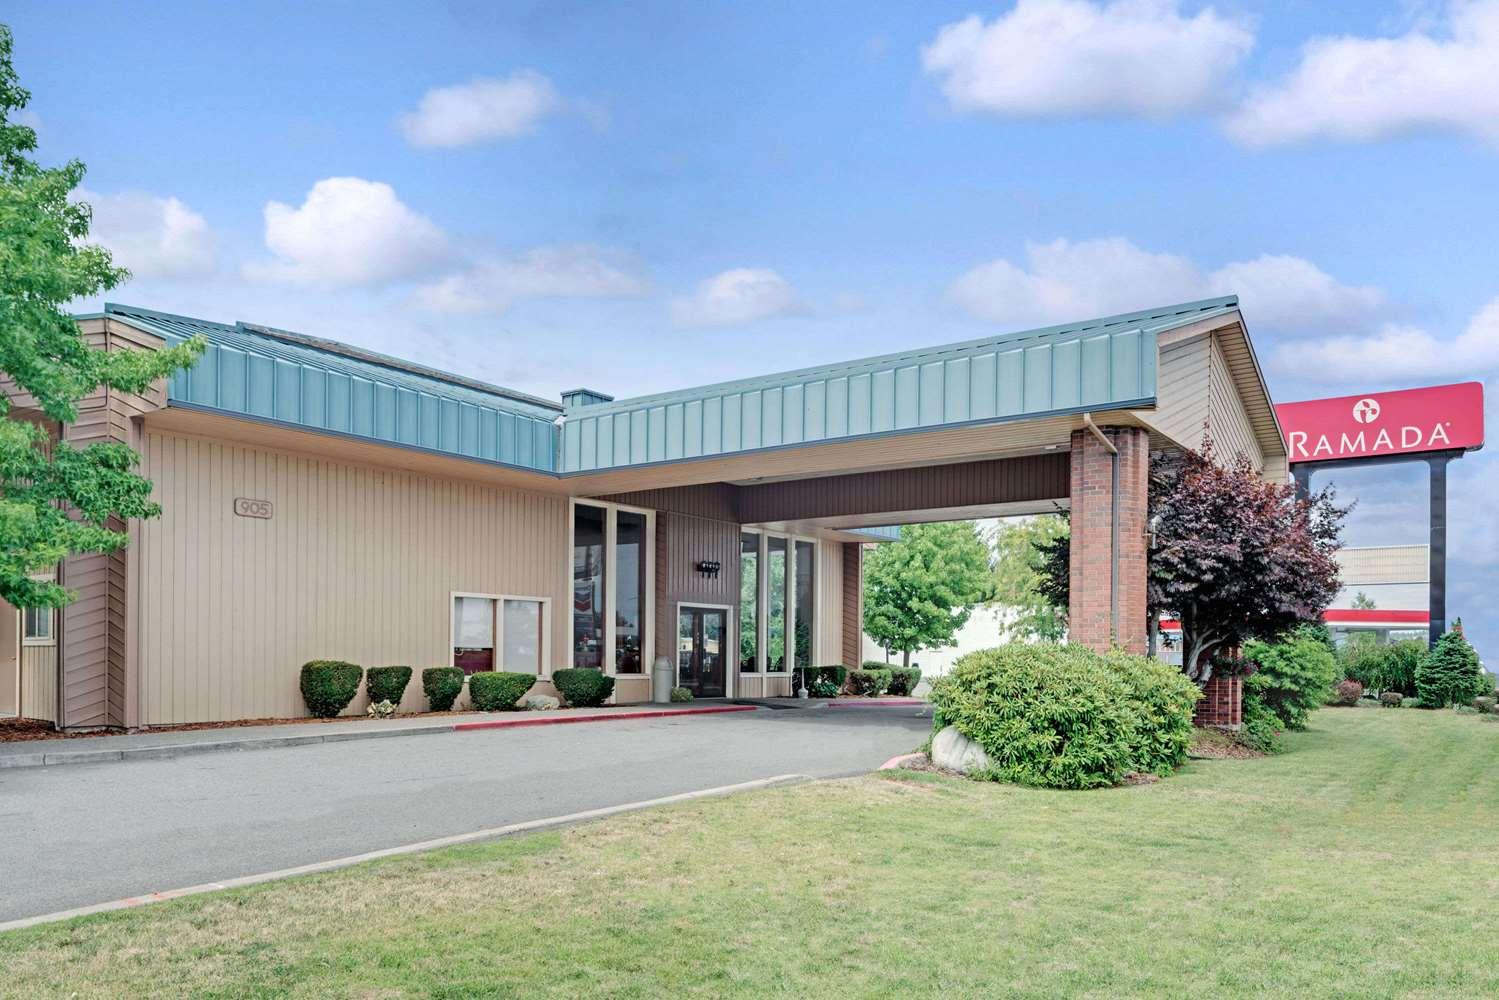 Ramada Inn Spokane Valley Veradale Wa See Discounts